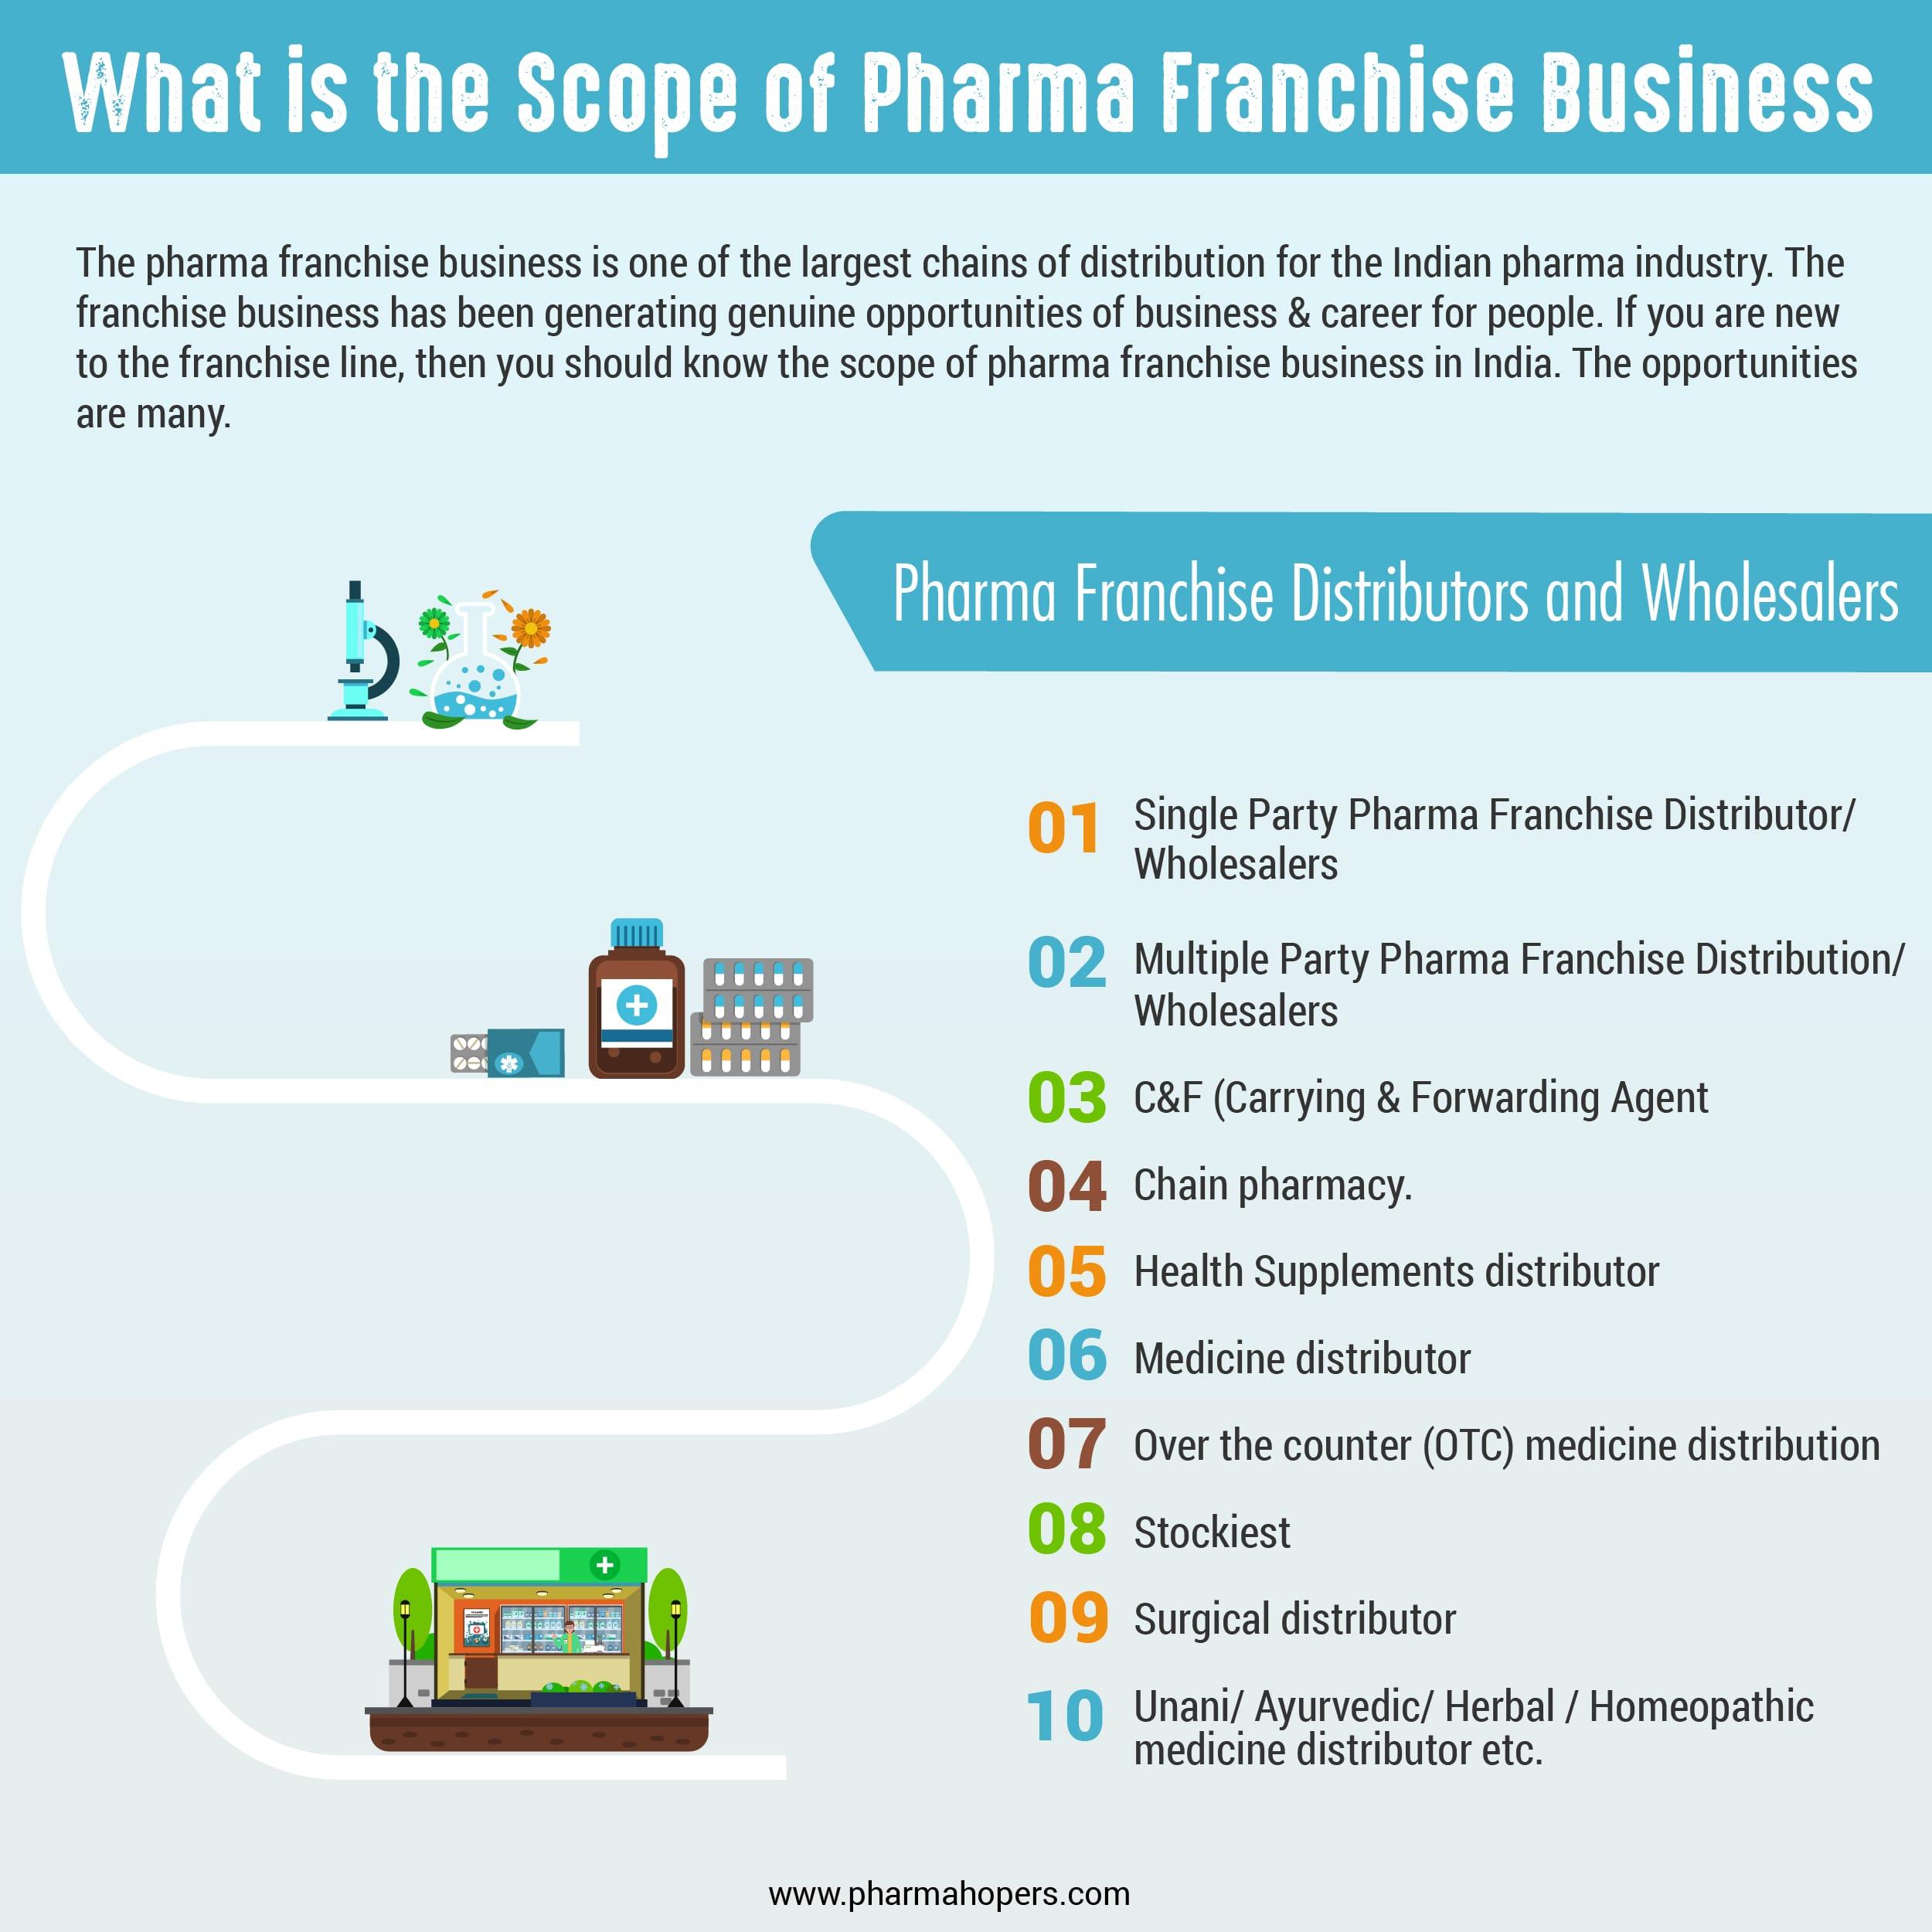 Scope of Pharma Franchise Business